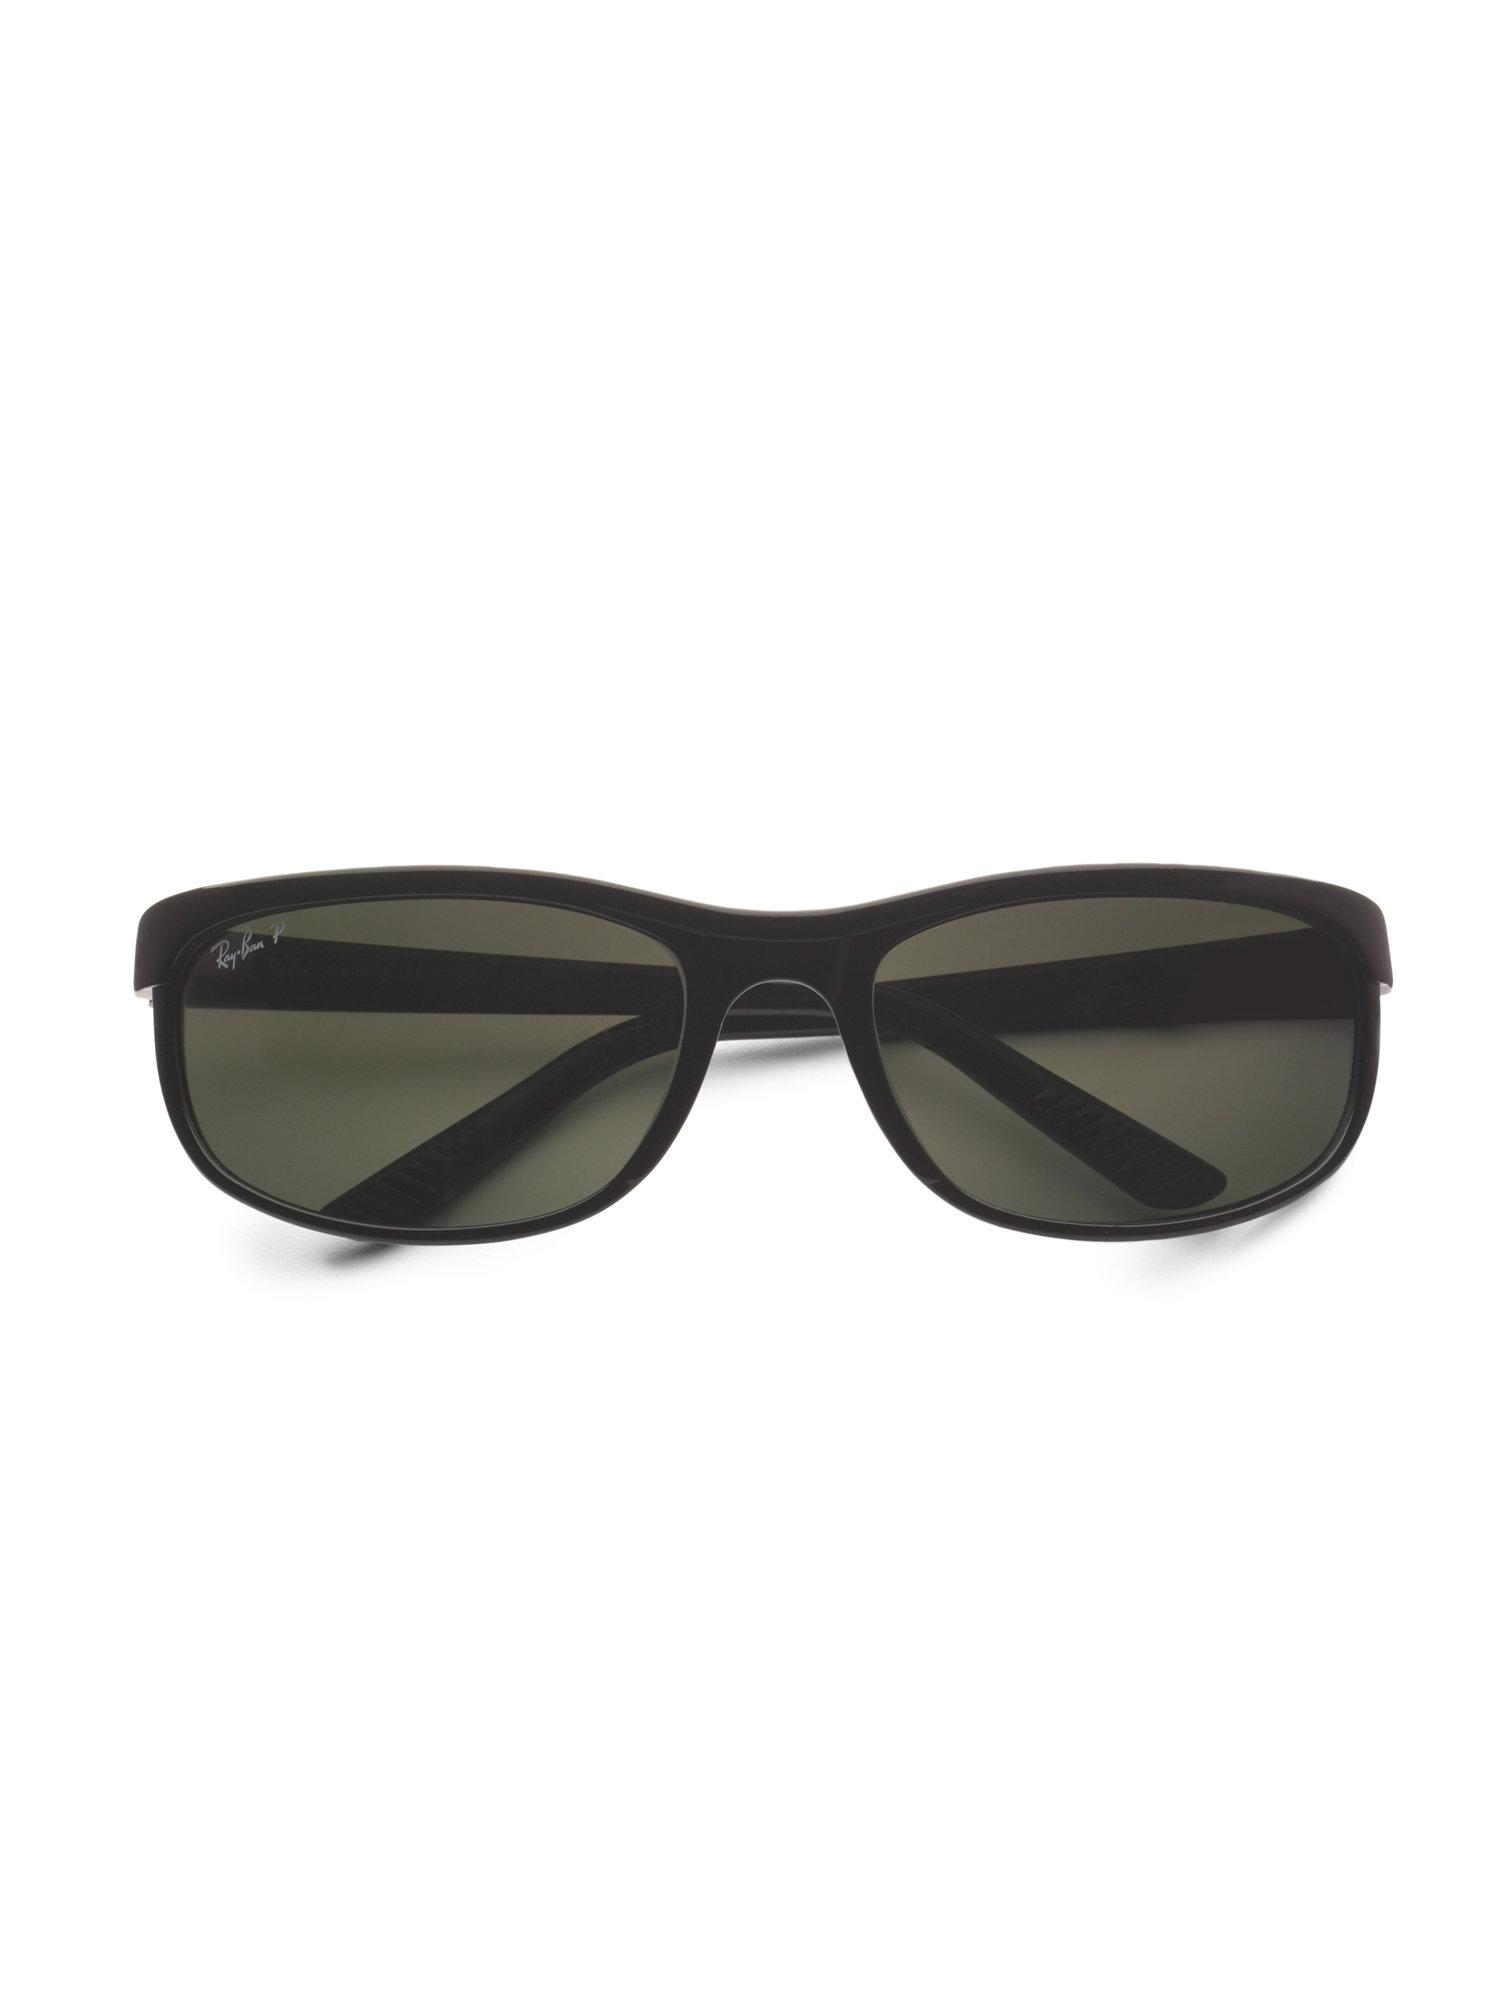 5e76297b447 Ray Ban Predator J Sunglasses « Heritage Malta